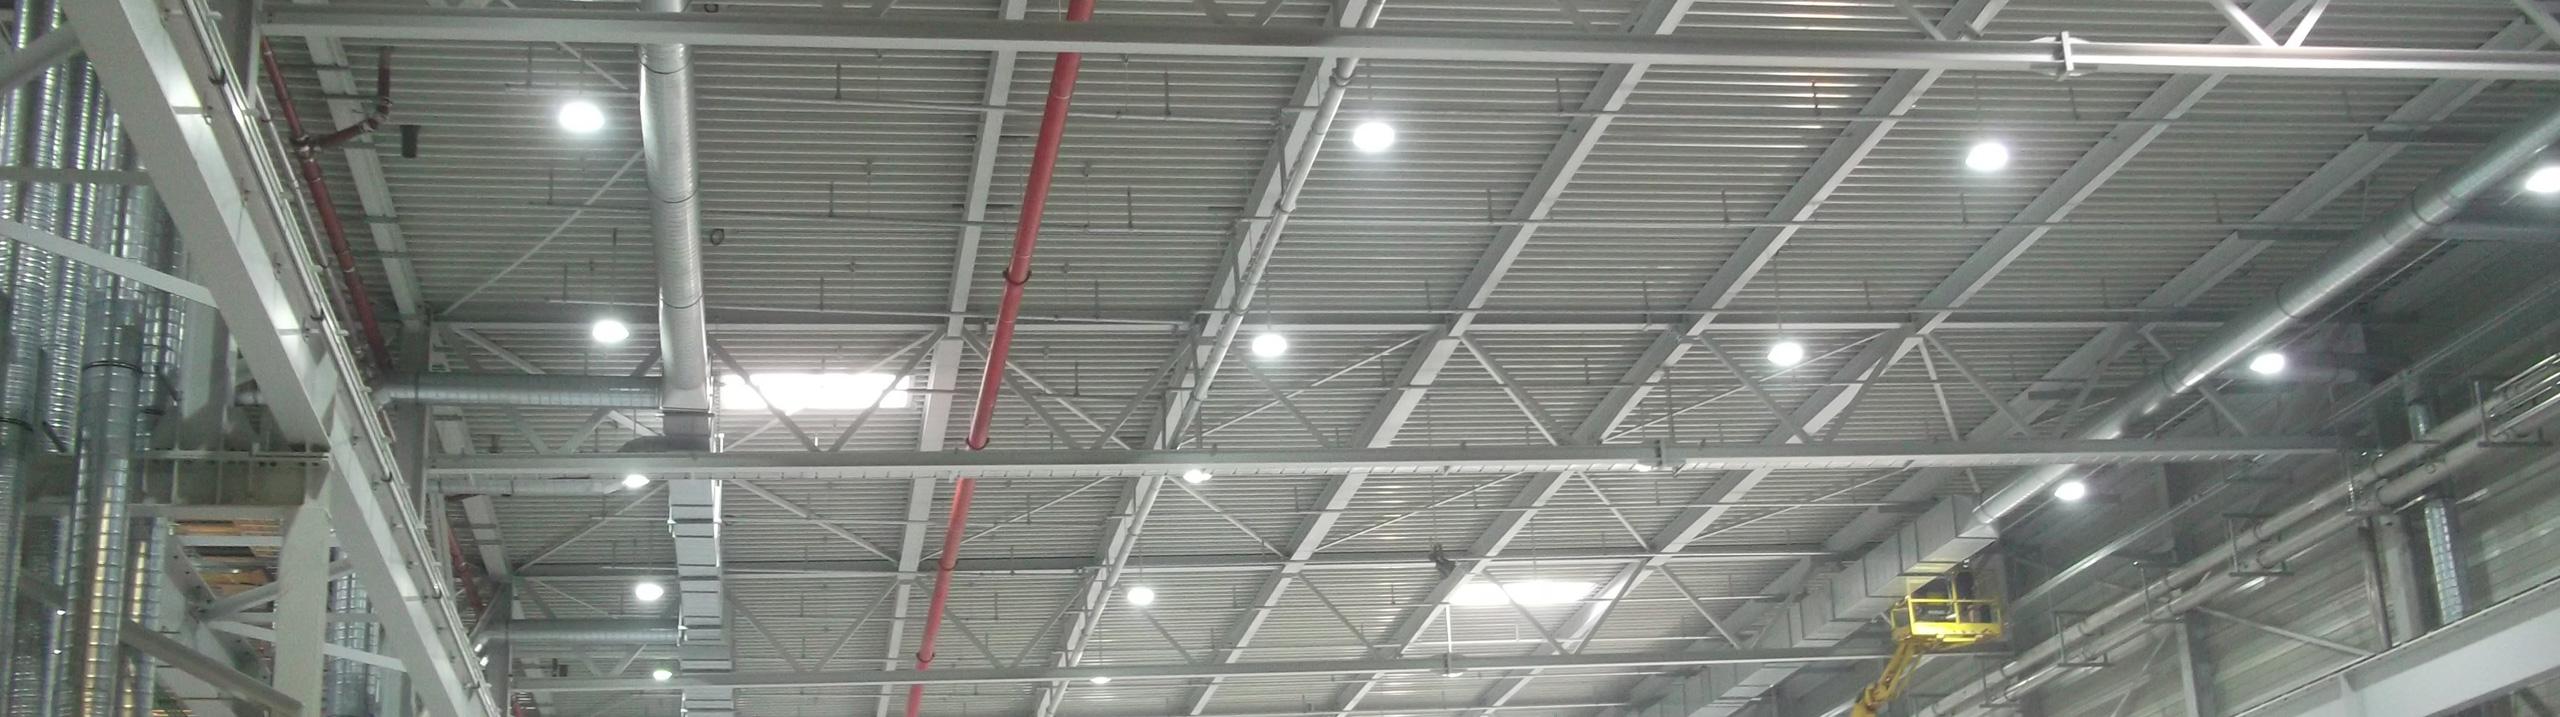 protec ENERGYPLUS GmbH Hallenbeleuchtung Industriebeleuchtung